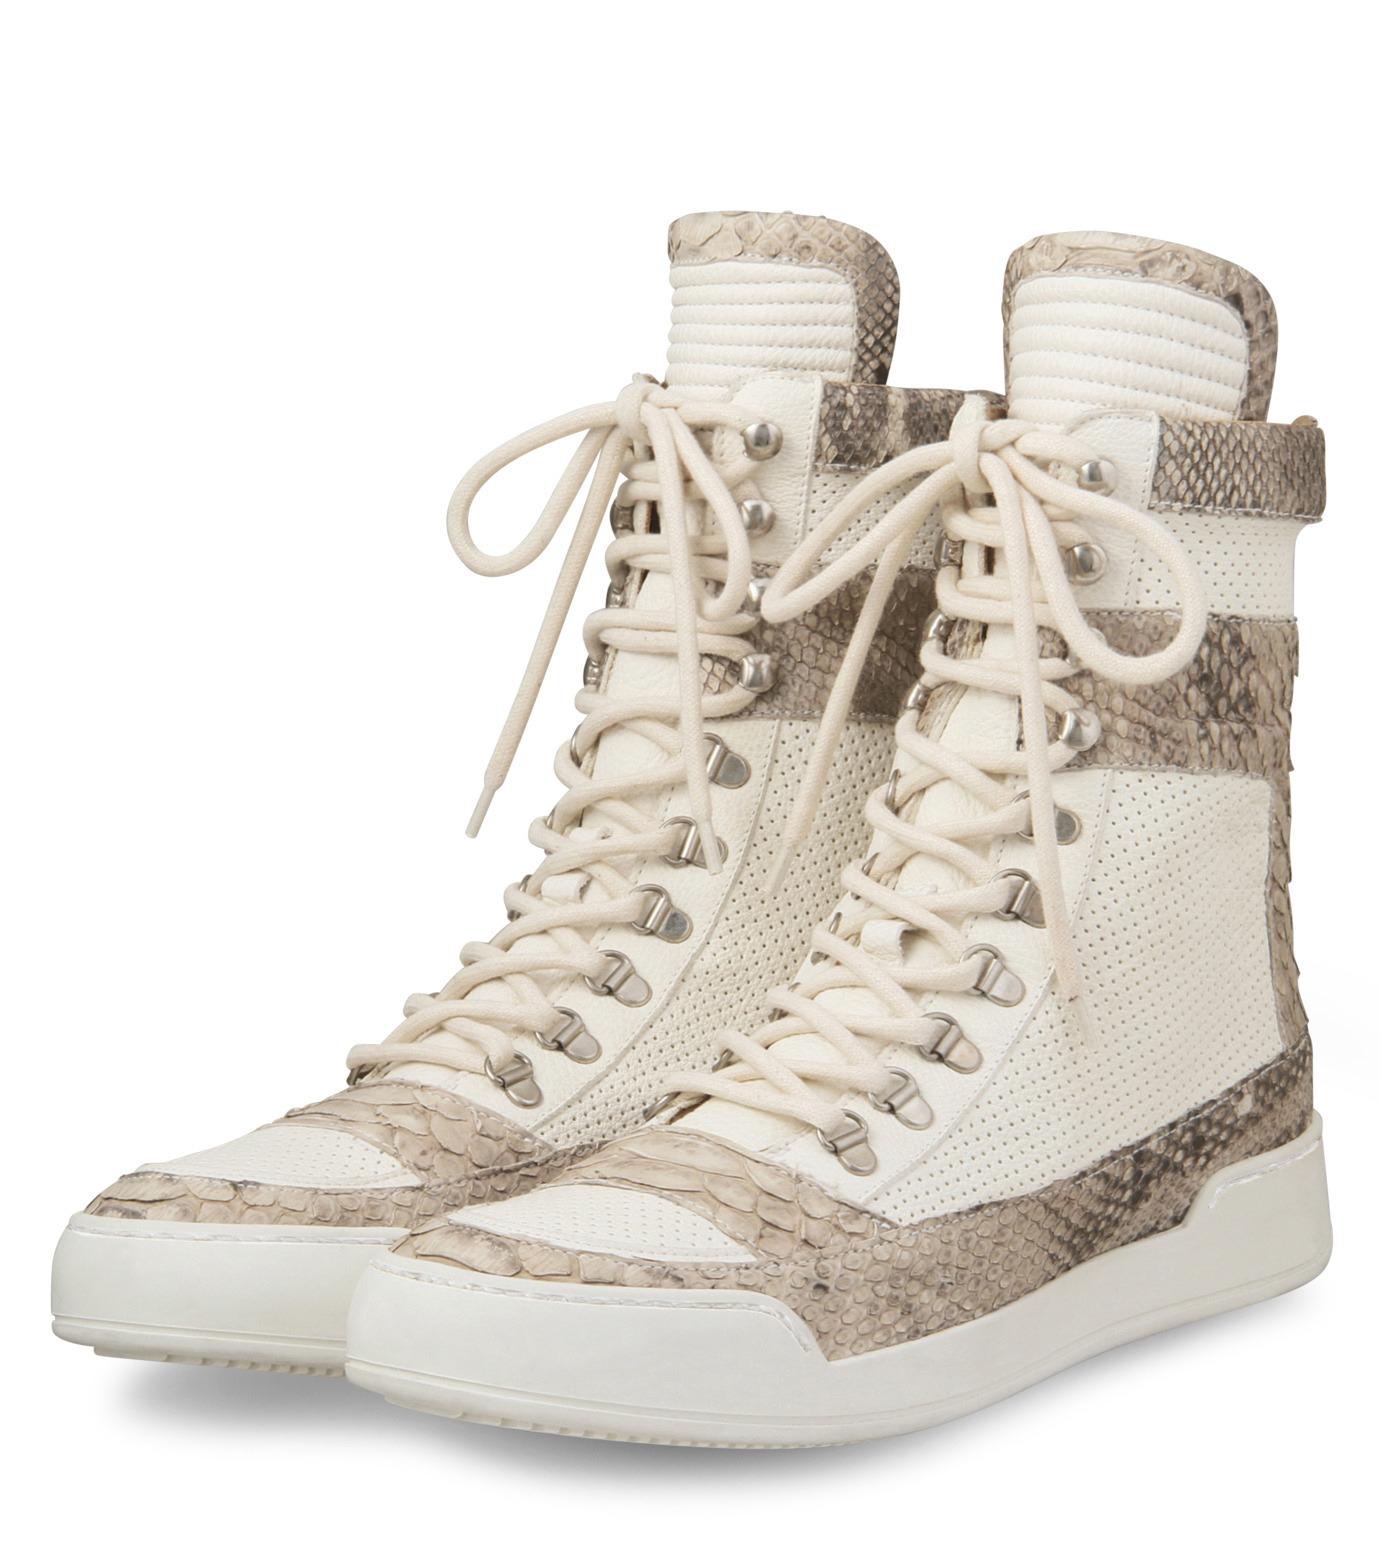 Balmain(バルマン)のHi cut sneaker-WHITE-T306-C189-4 拡大詳細画像4